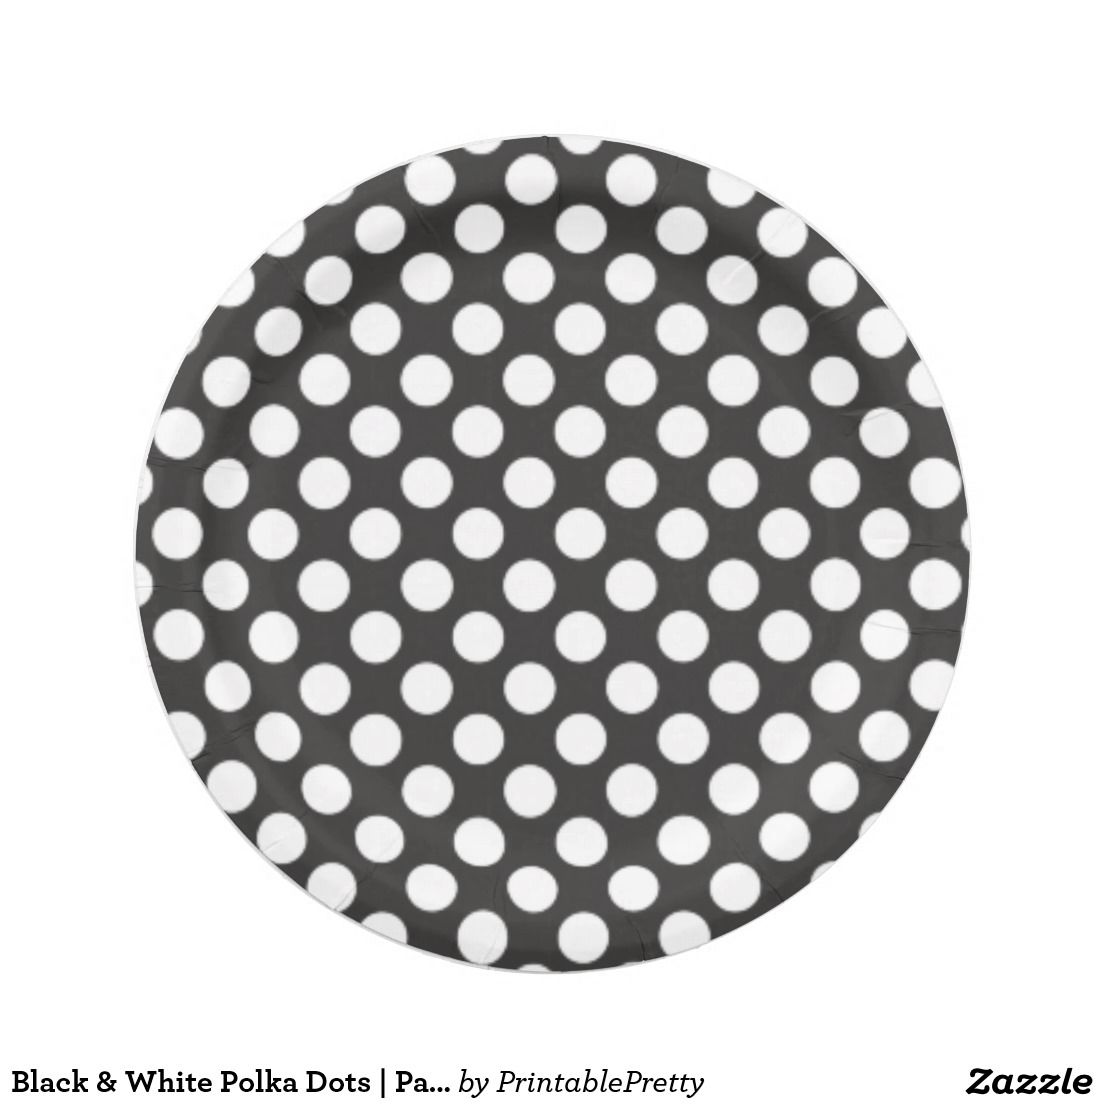 Black & White Polka Dots | Paper Plates | Custom Party ...